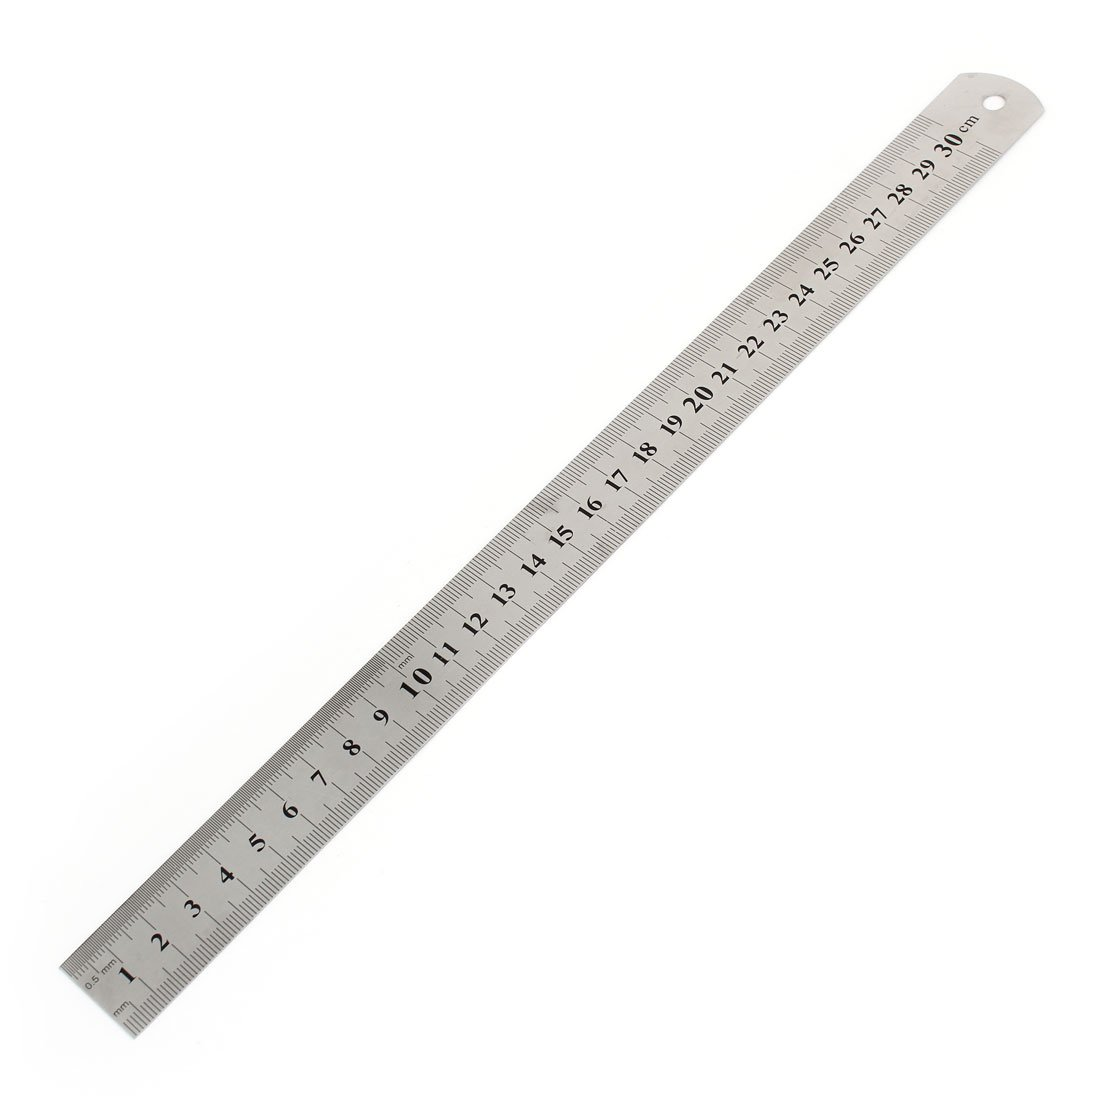 Student 30 cm 30, 5 cm Double Seiten Metrisches gerade Lineal Silber Ton Sourcingmap a14092600ux0653